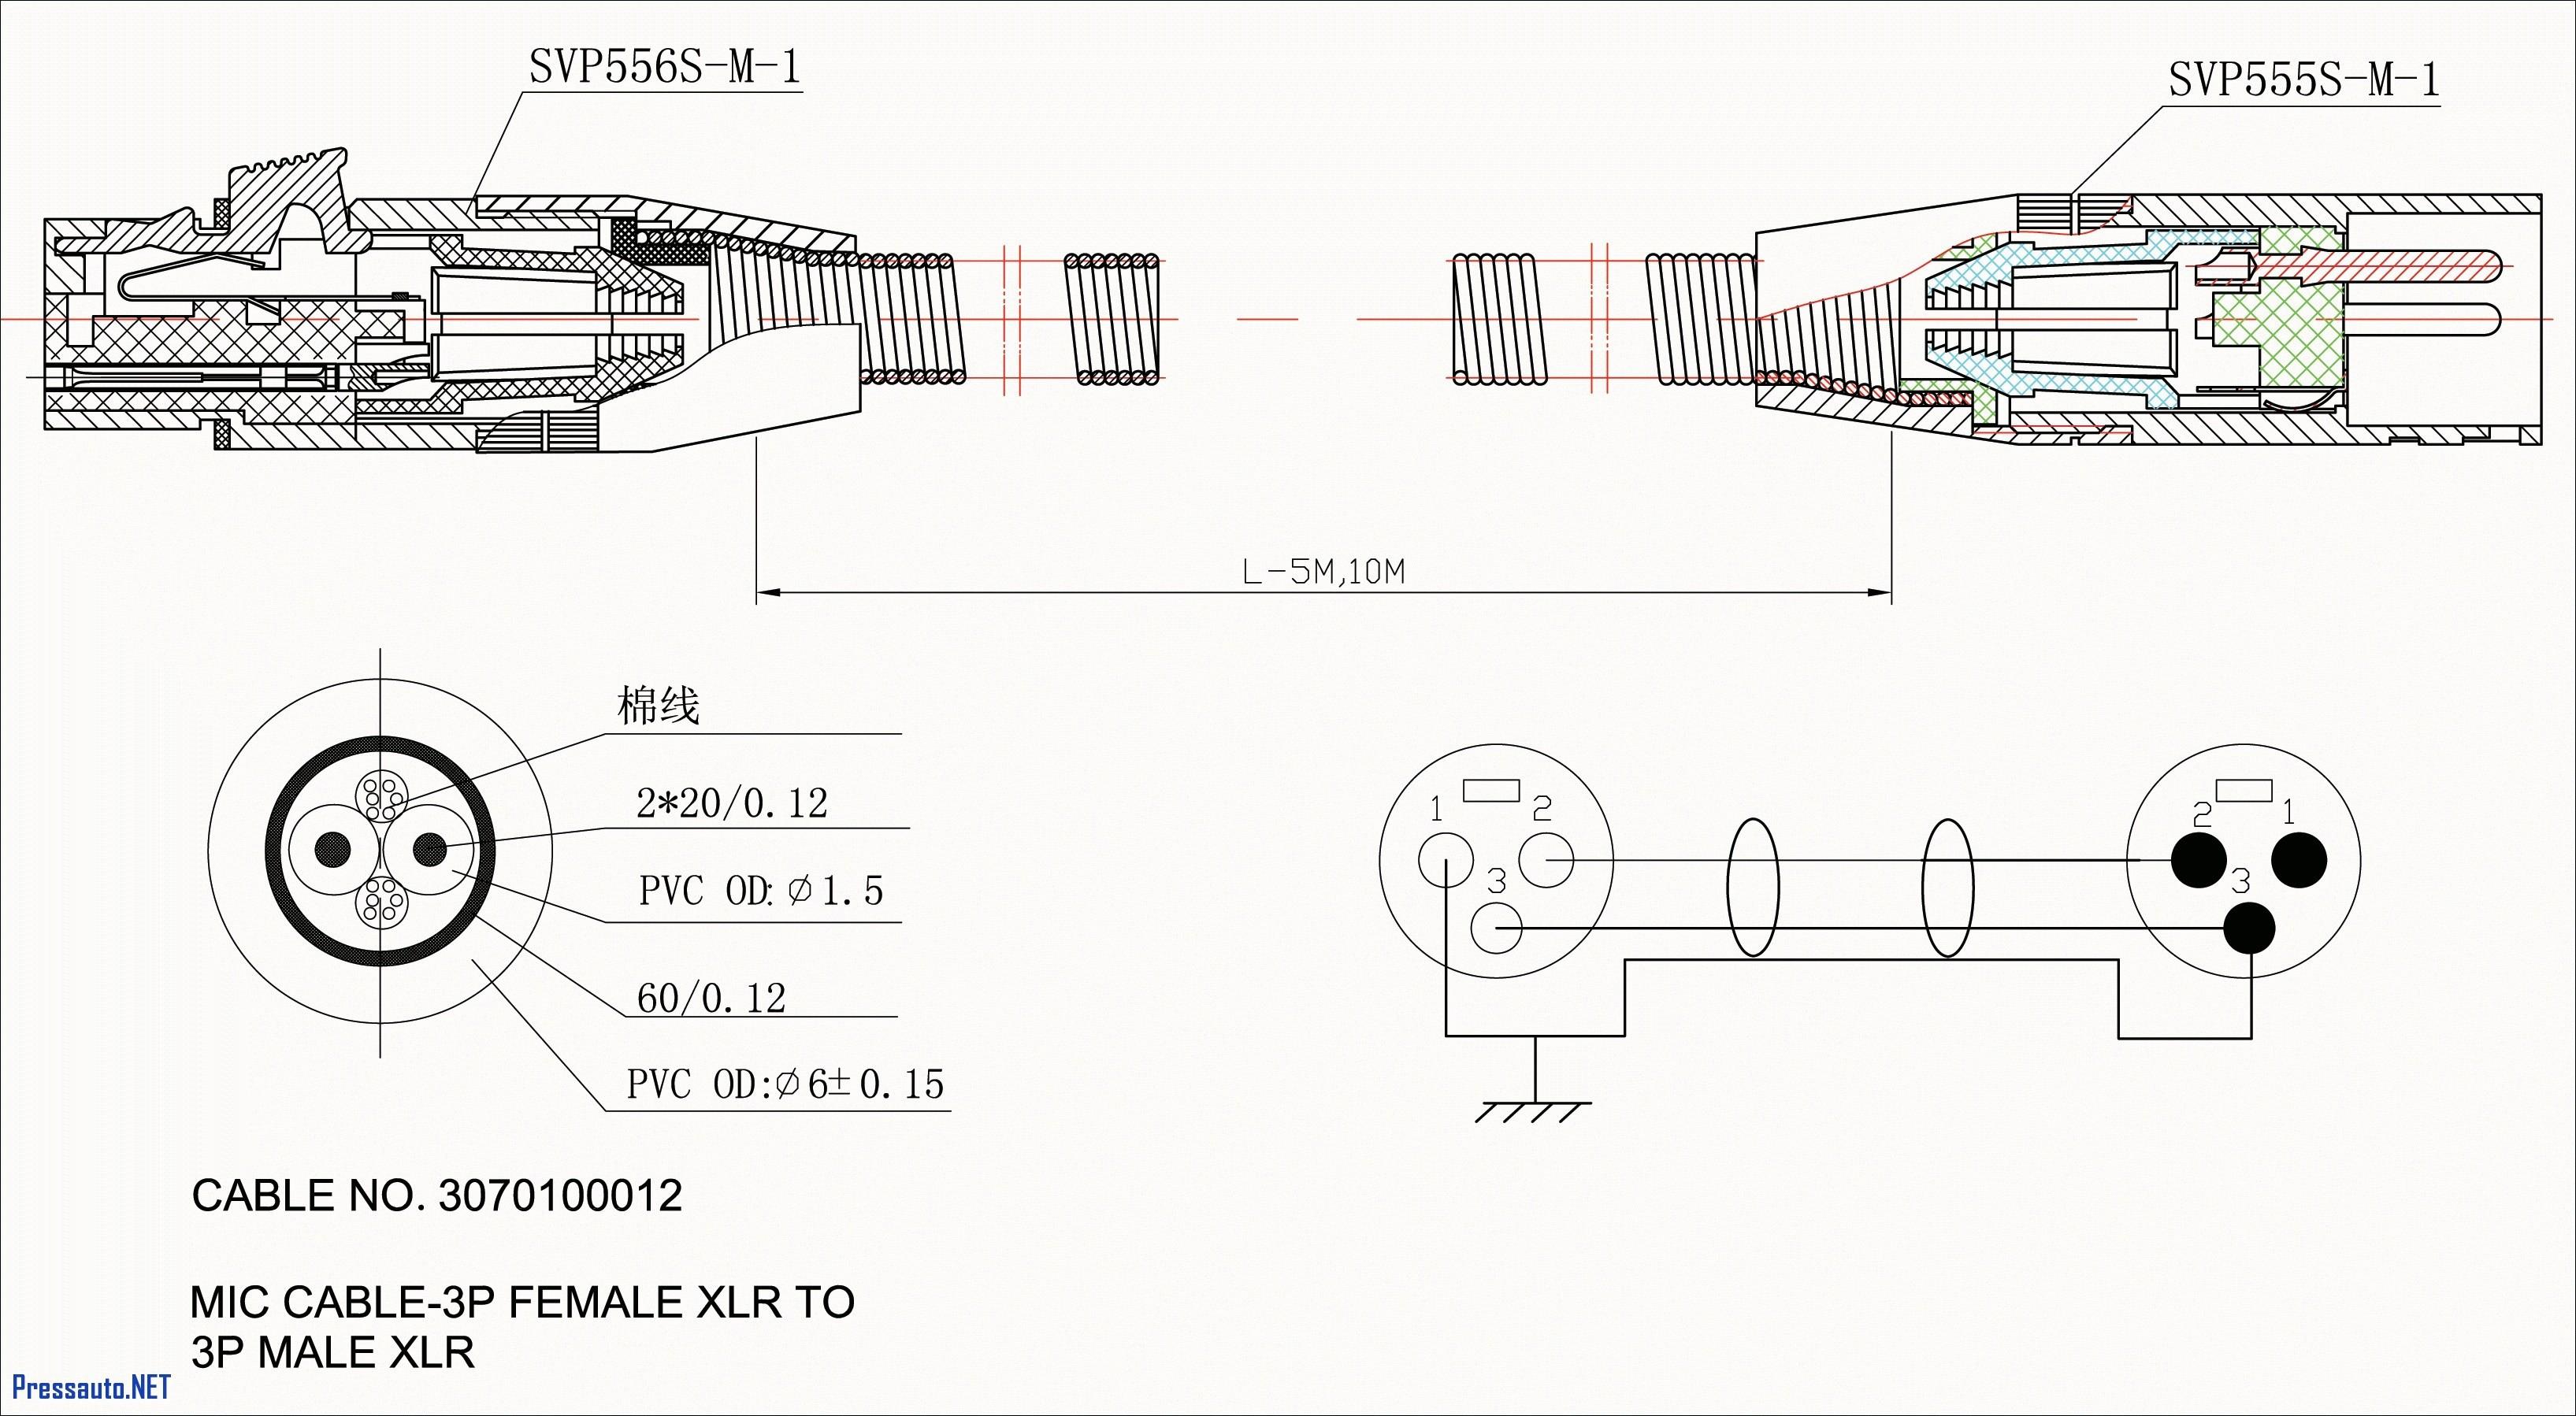 7 Way Trailer Plug Wiring Diagram 7 Wire Trailer Plug Diagram New ford F 150 Lights Wiring Harness Of 7 Way Trailer Plug Wiring Diagram